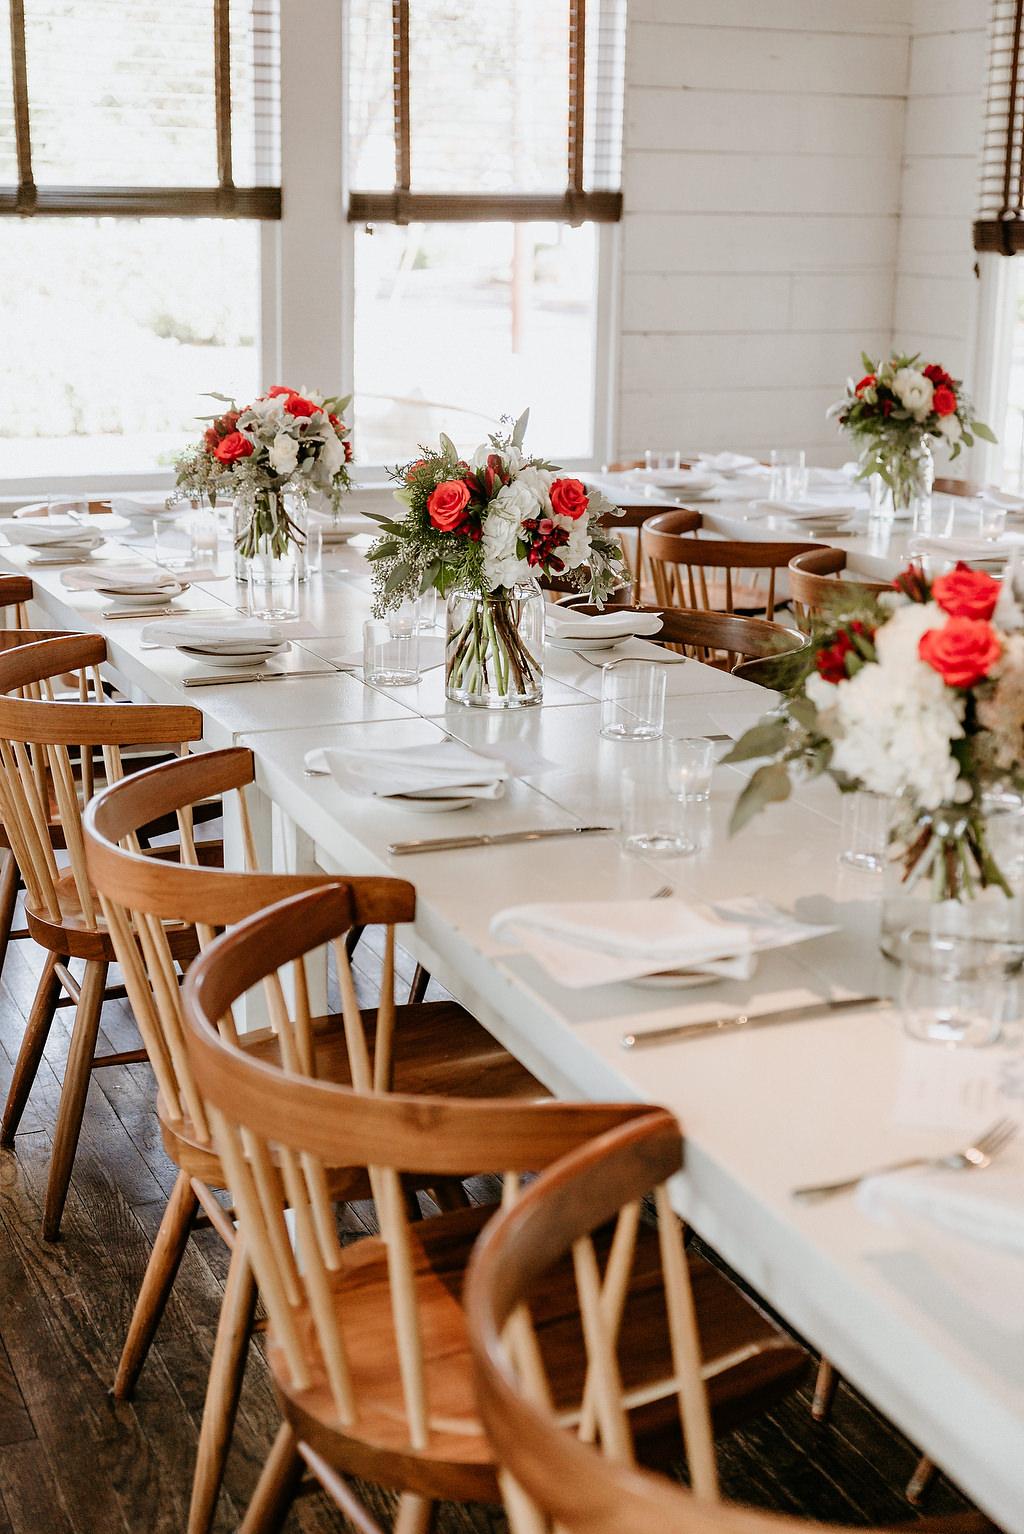 2018-HINGST-WEDDING-017-ANINDOORLADY